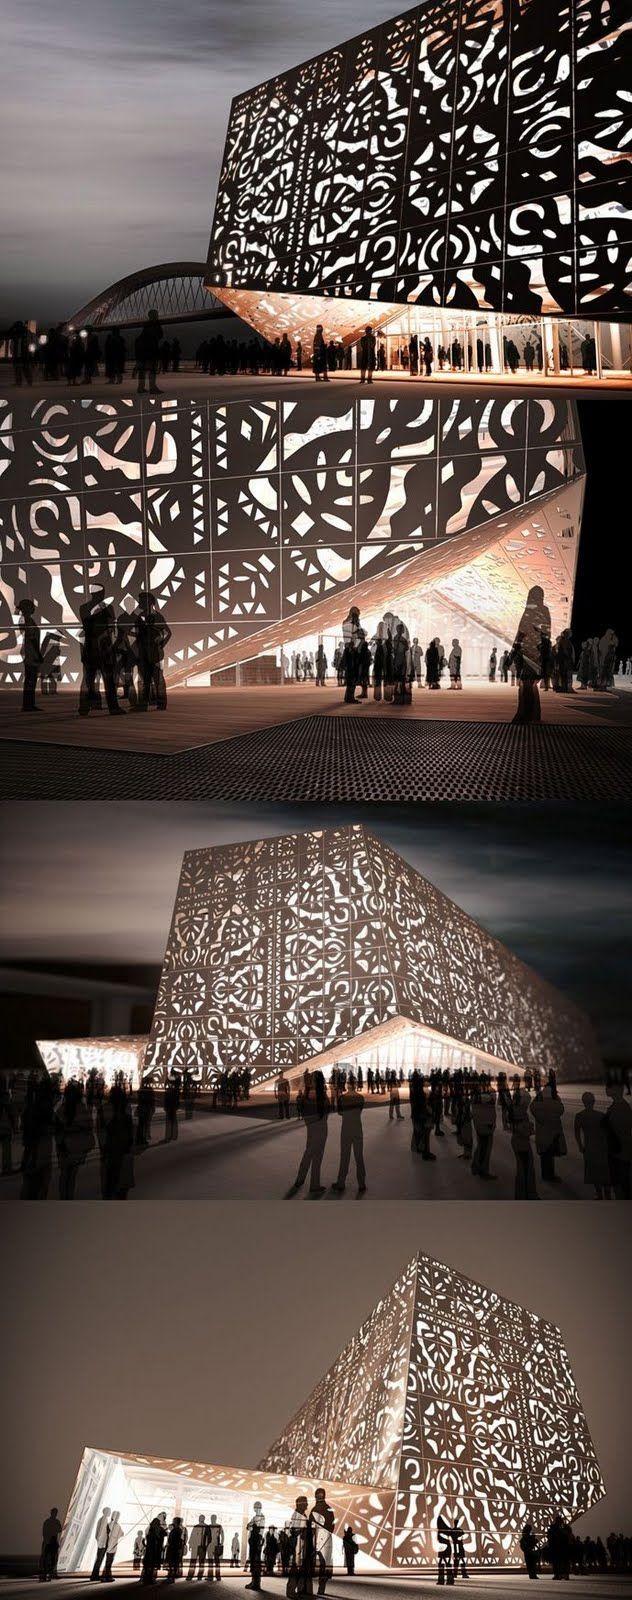 For more amazing architecture... - Visit: TheEndearingDesigner.com